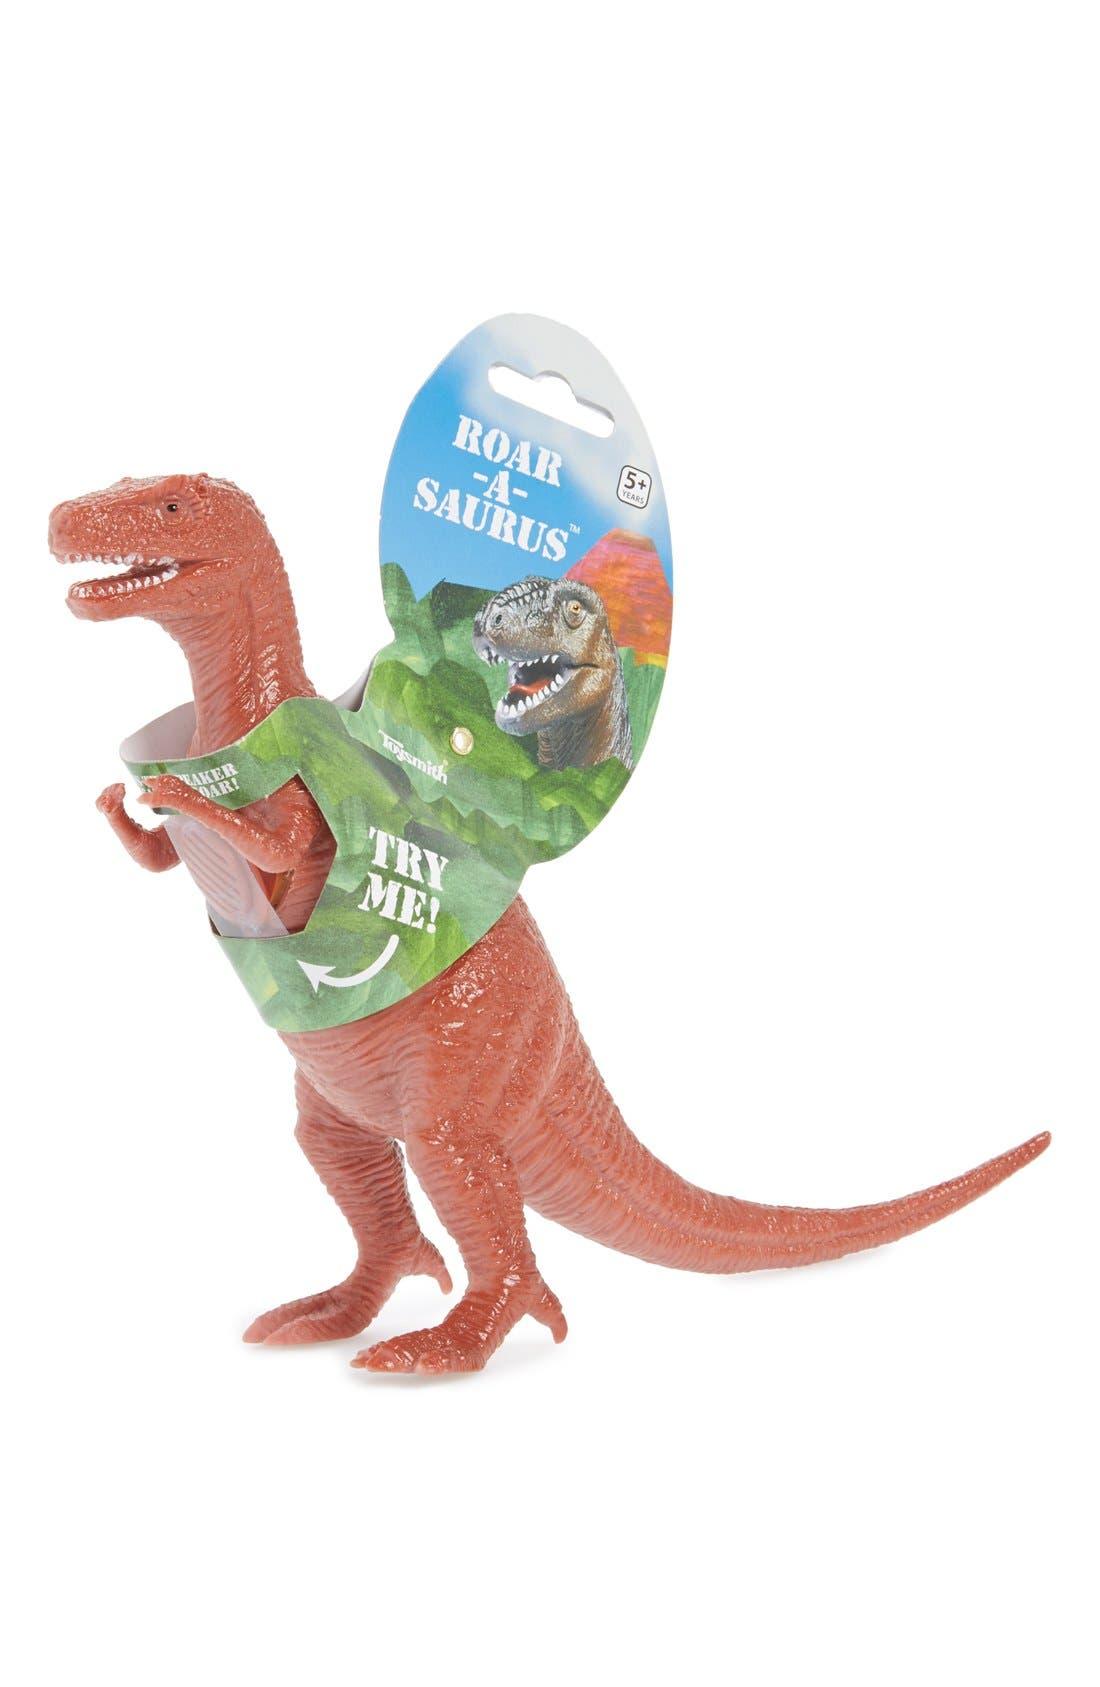 'Roarasaurus' Roaring Dinosaur Figurine,                             Main thumbnail 1, color,                             000